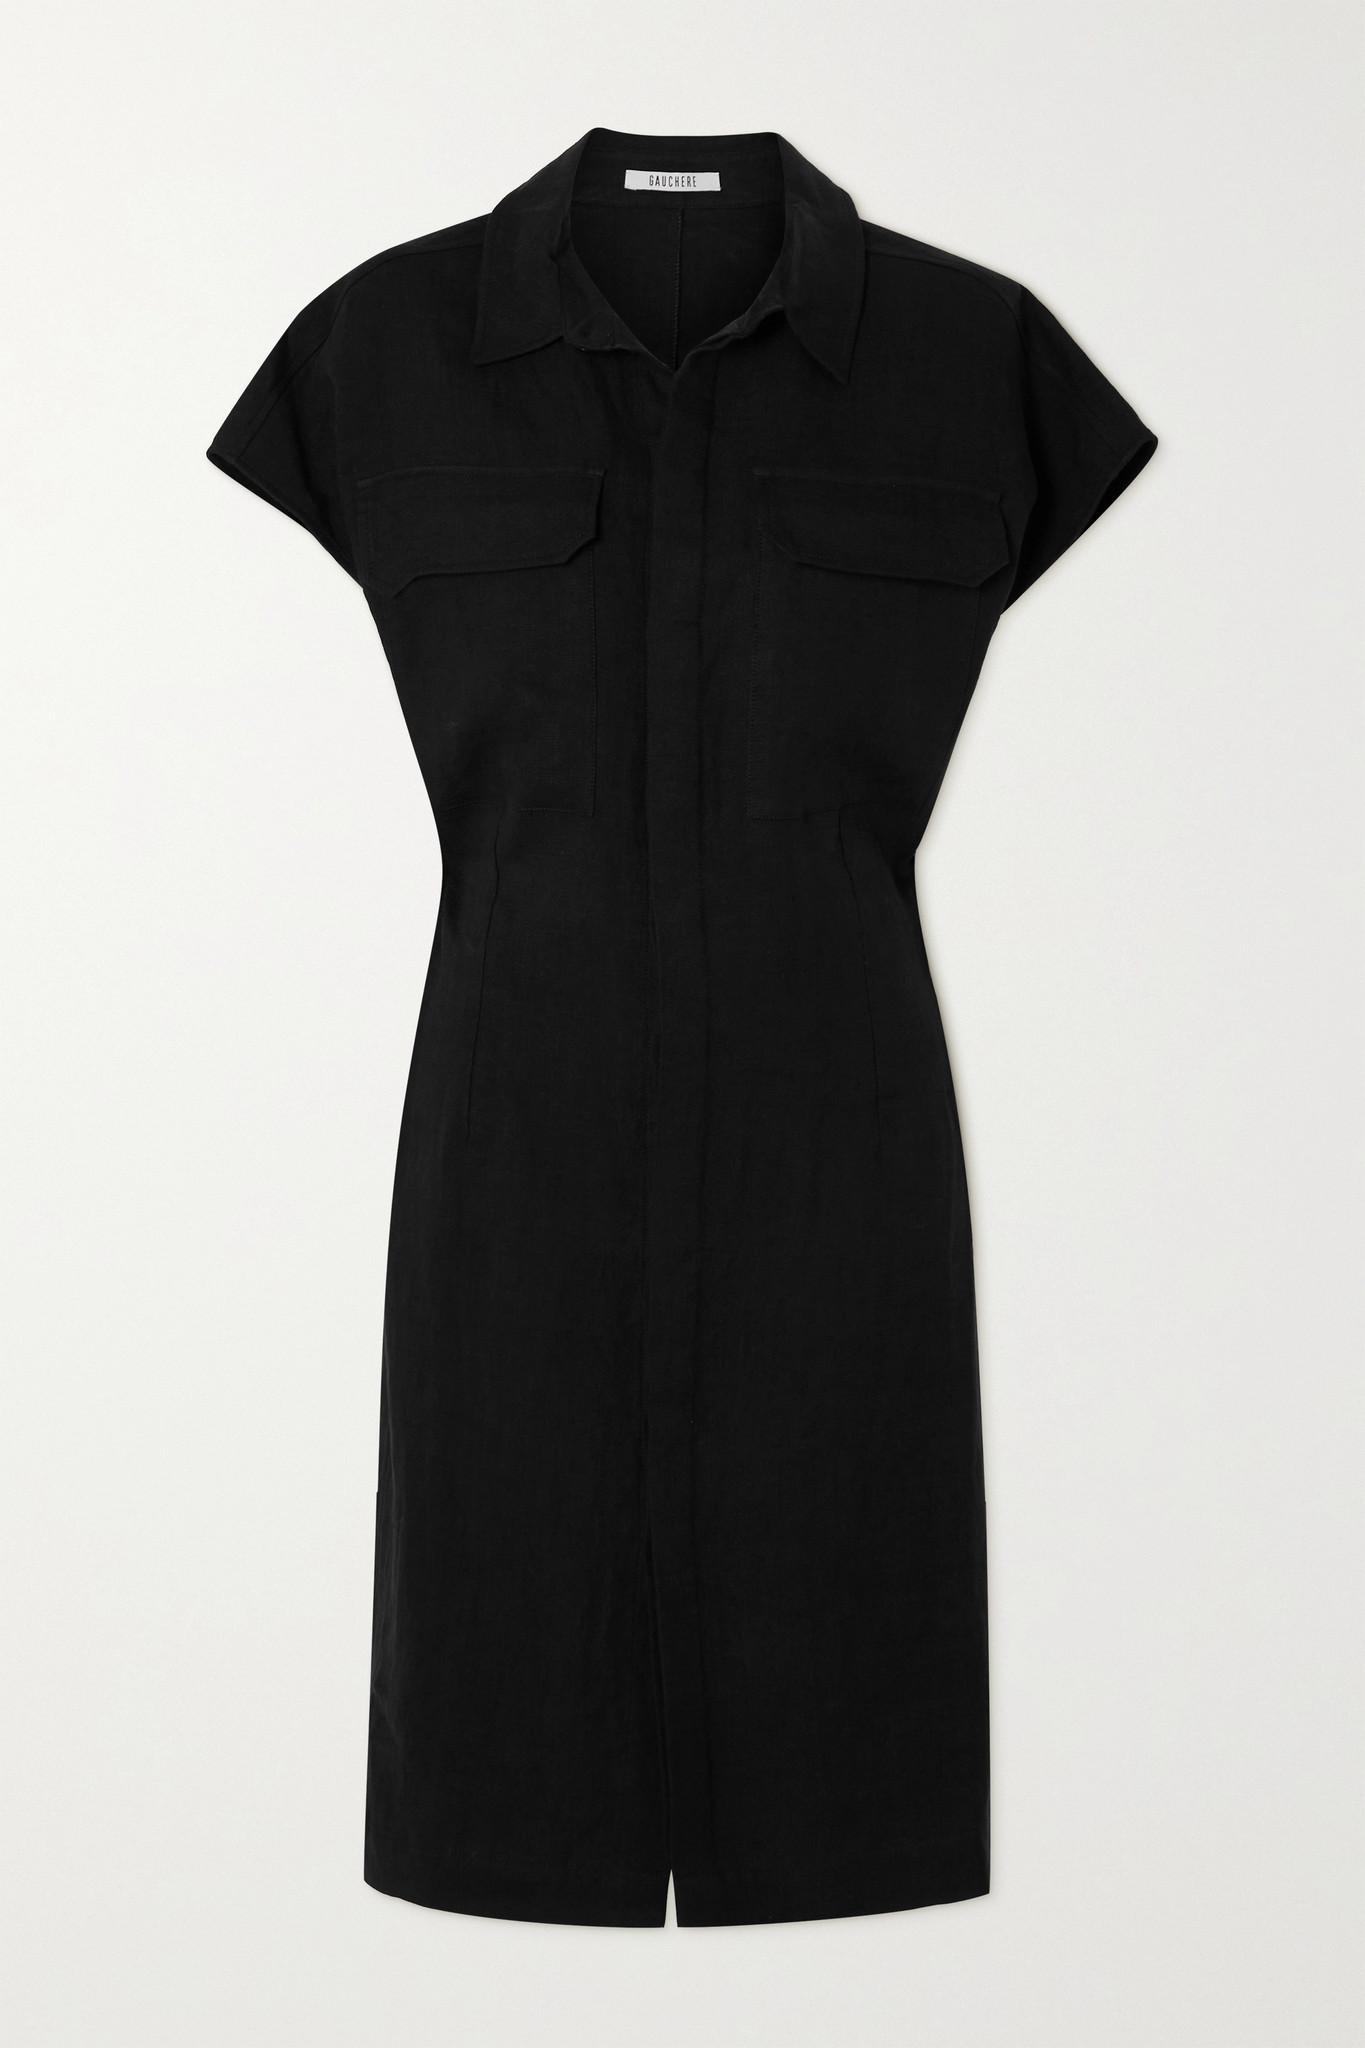 GAUCHERE - Seffa 亚麻衬衫式连衣裙 - 黑色 - FR36